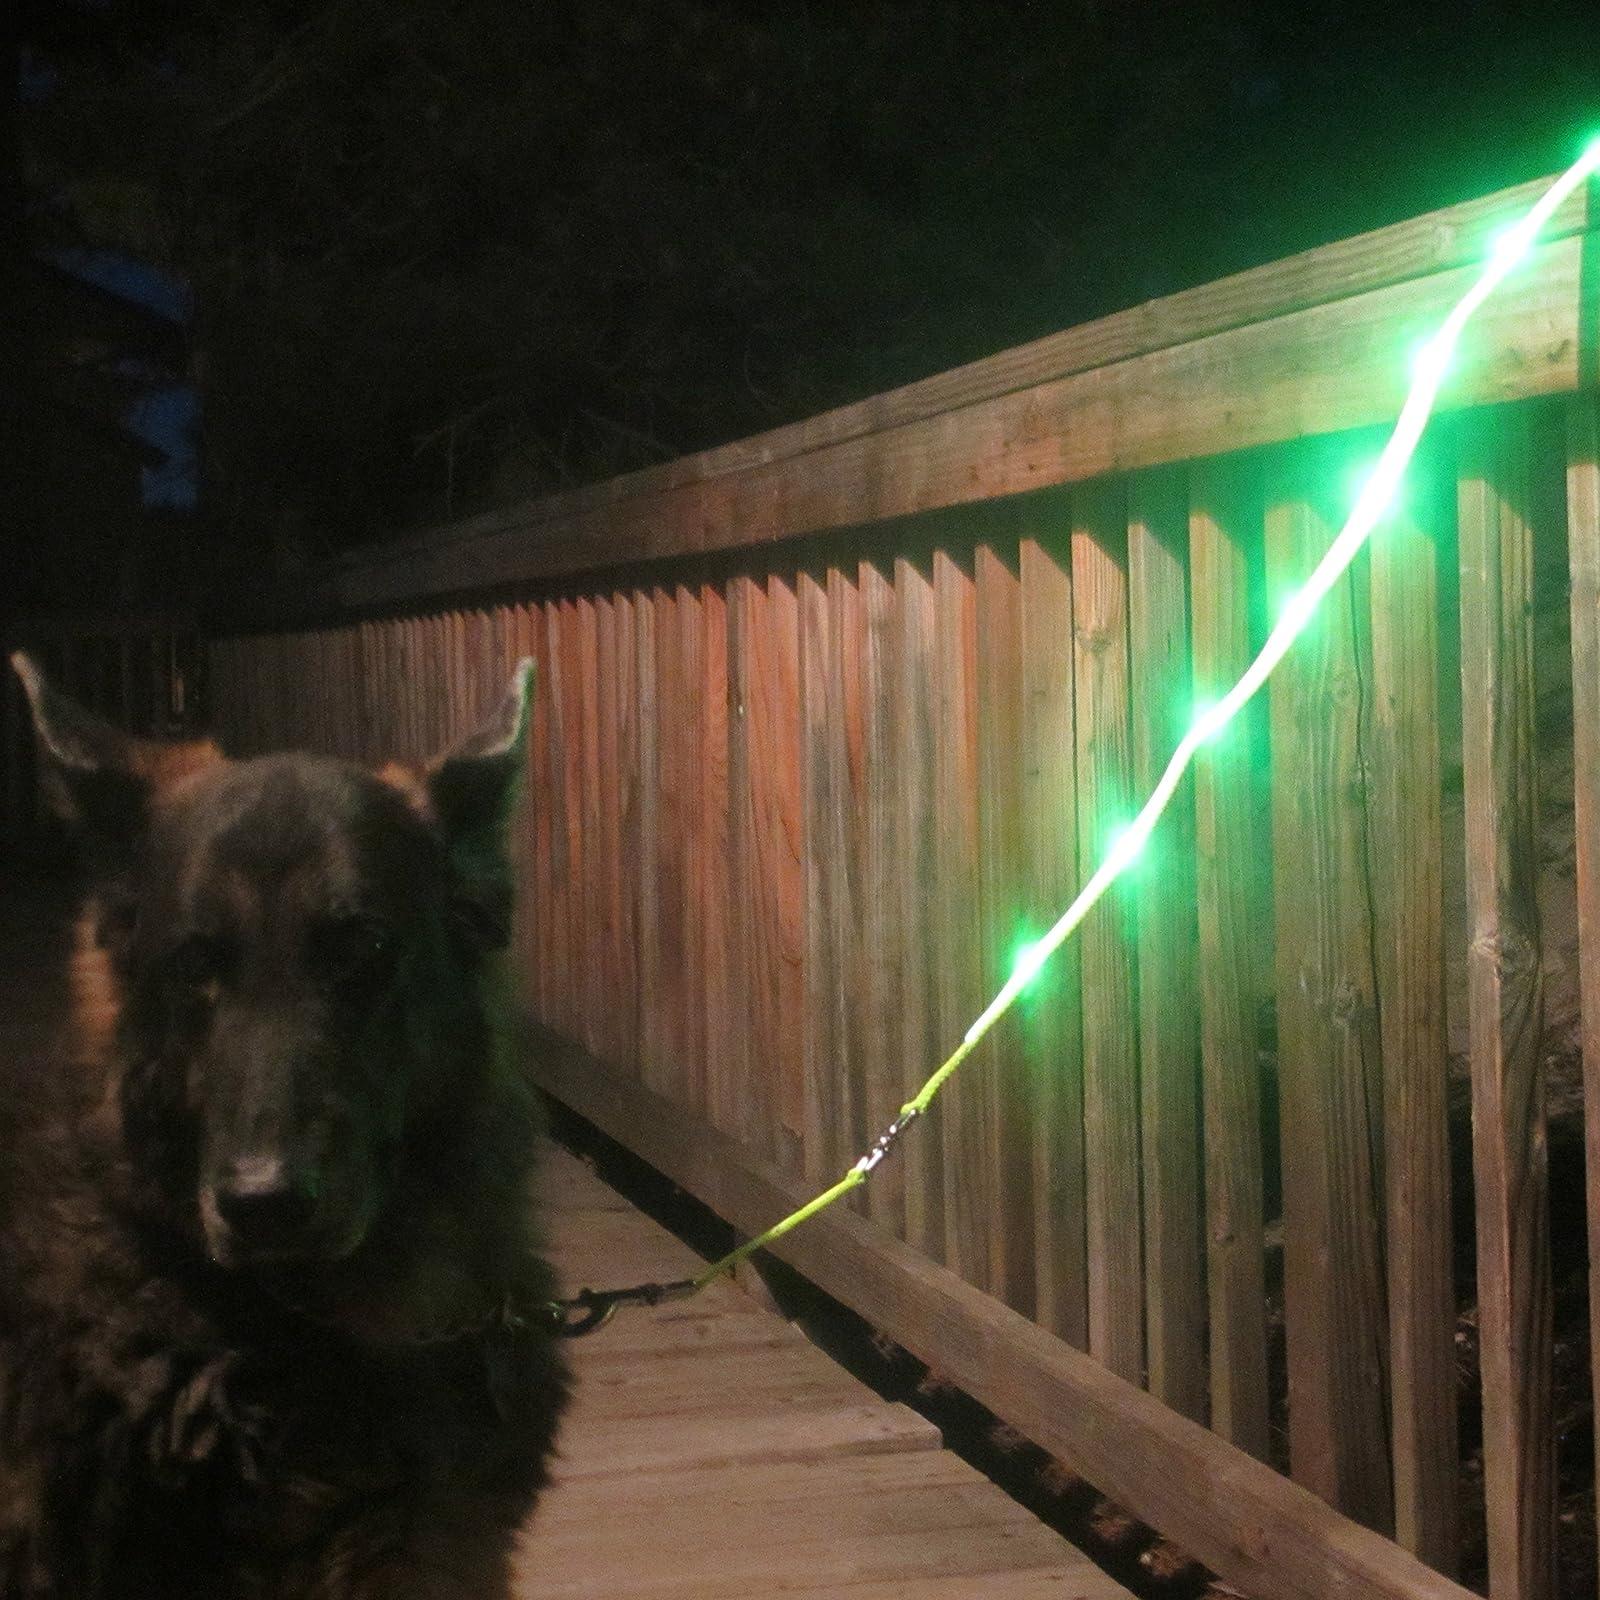 Blazin' Safety LED Dog Leash - USB Rechargeable - 1